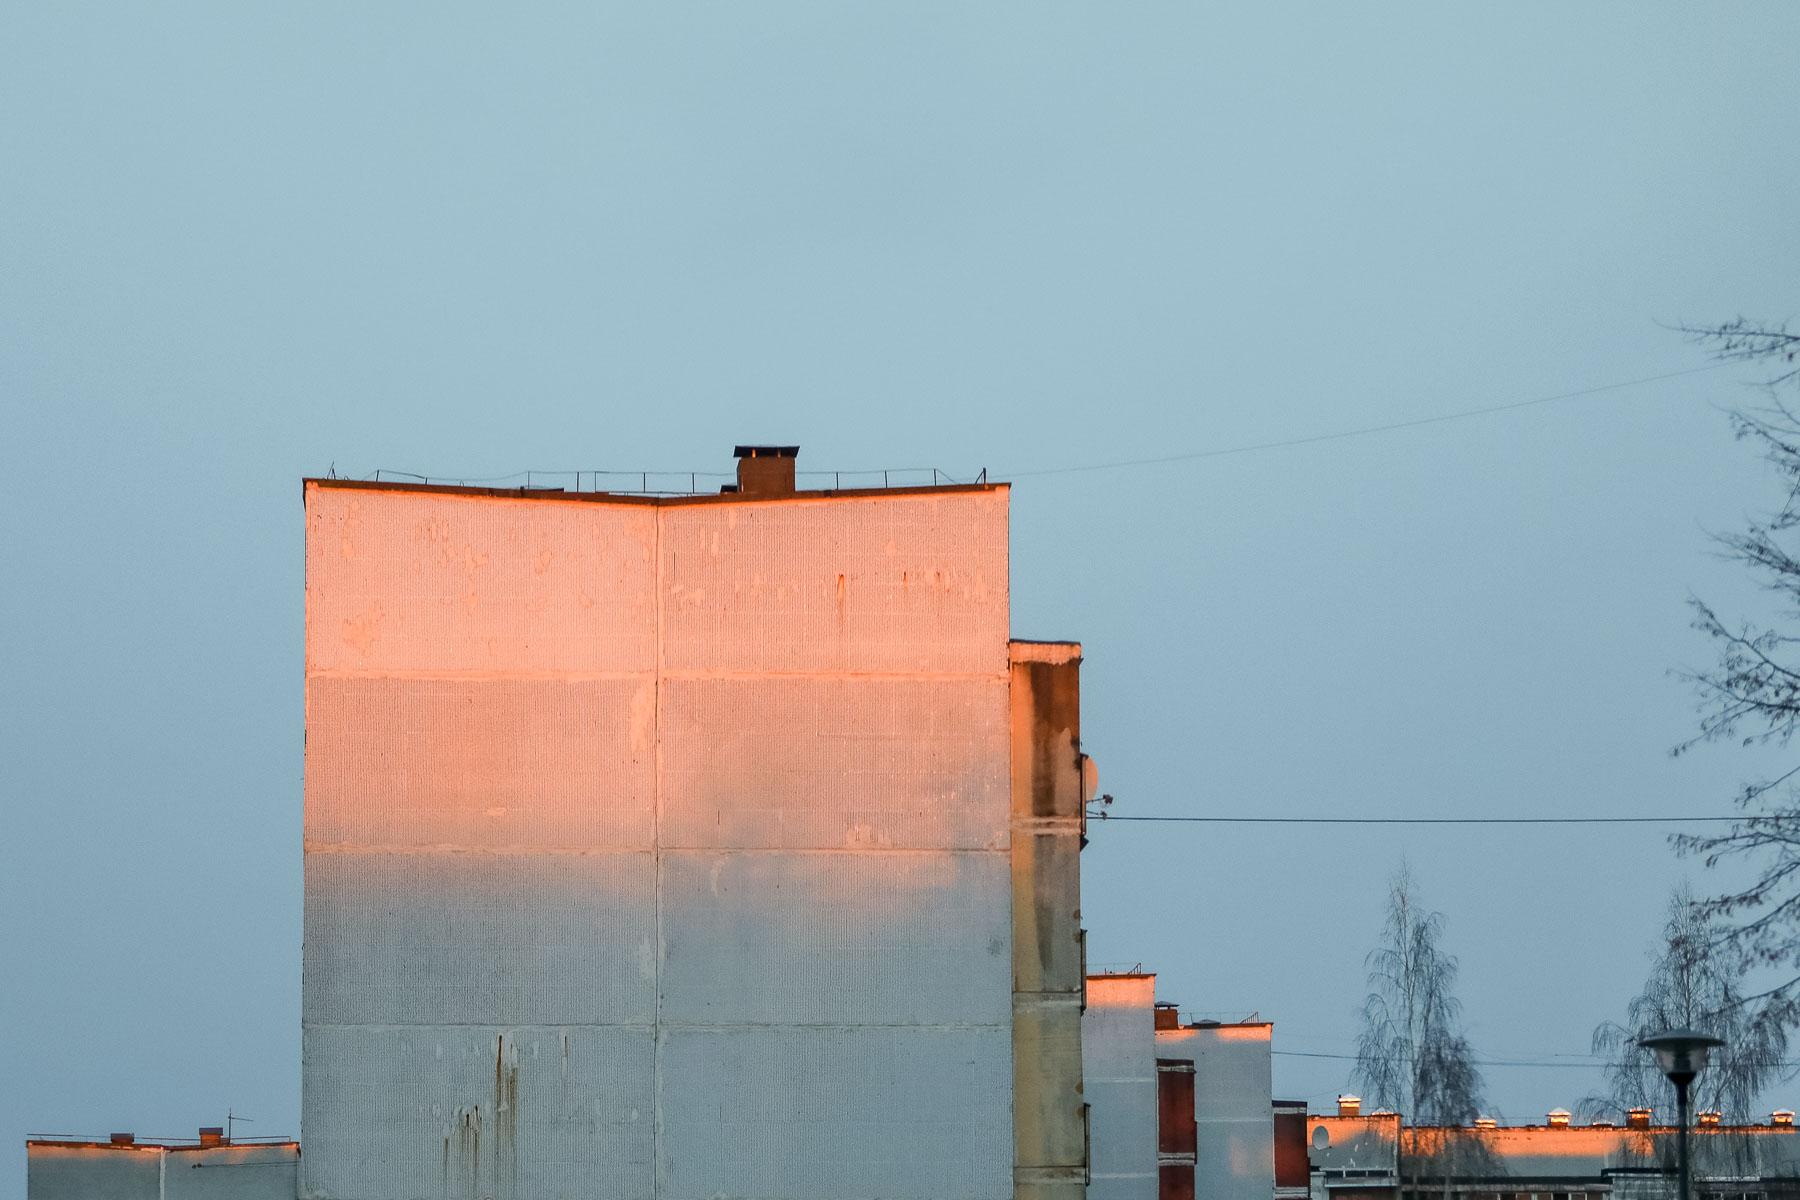 Landscape-cityscape-photography-jelgava-latvia-blocs-blocks-flat-post-soviet--Советские-квартиры-спальный-район-Латвия-город-фотограф-natalia-smith-photography-0089.jpg